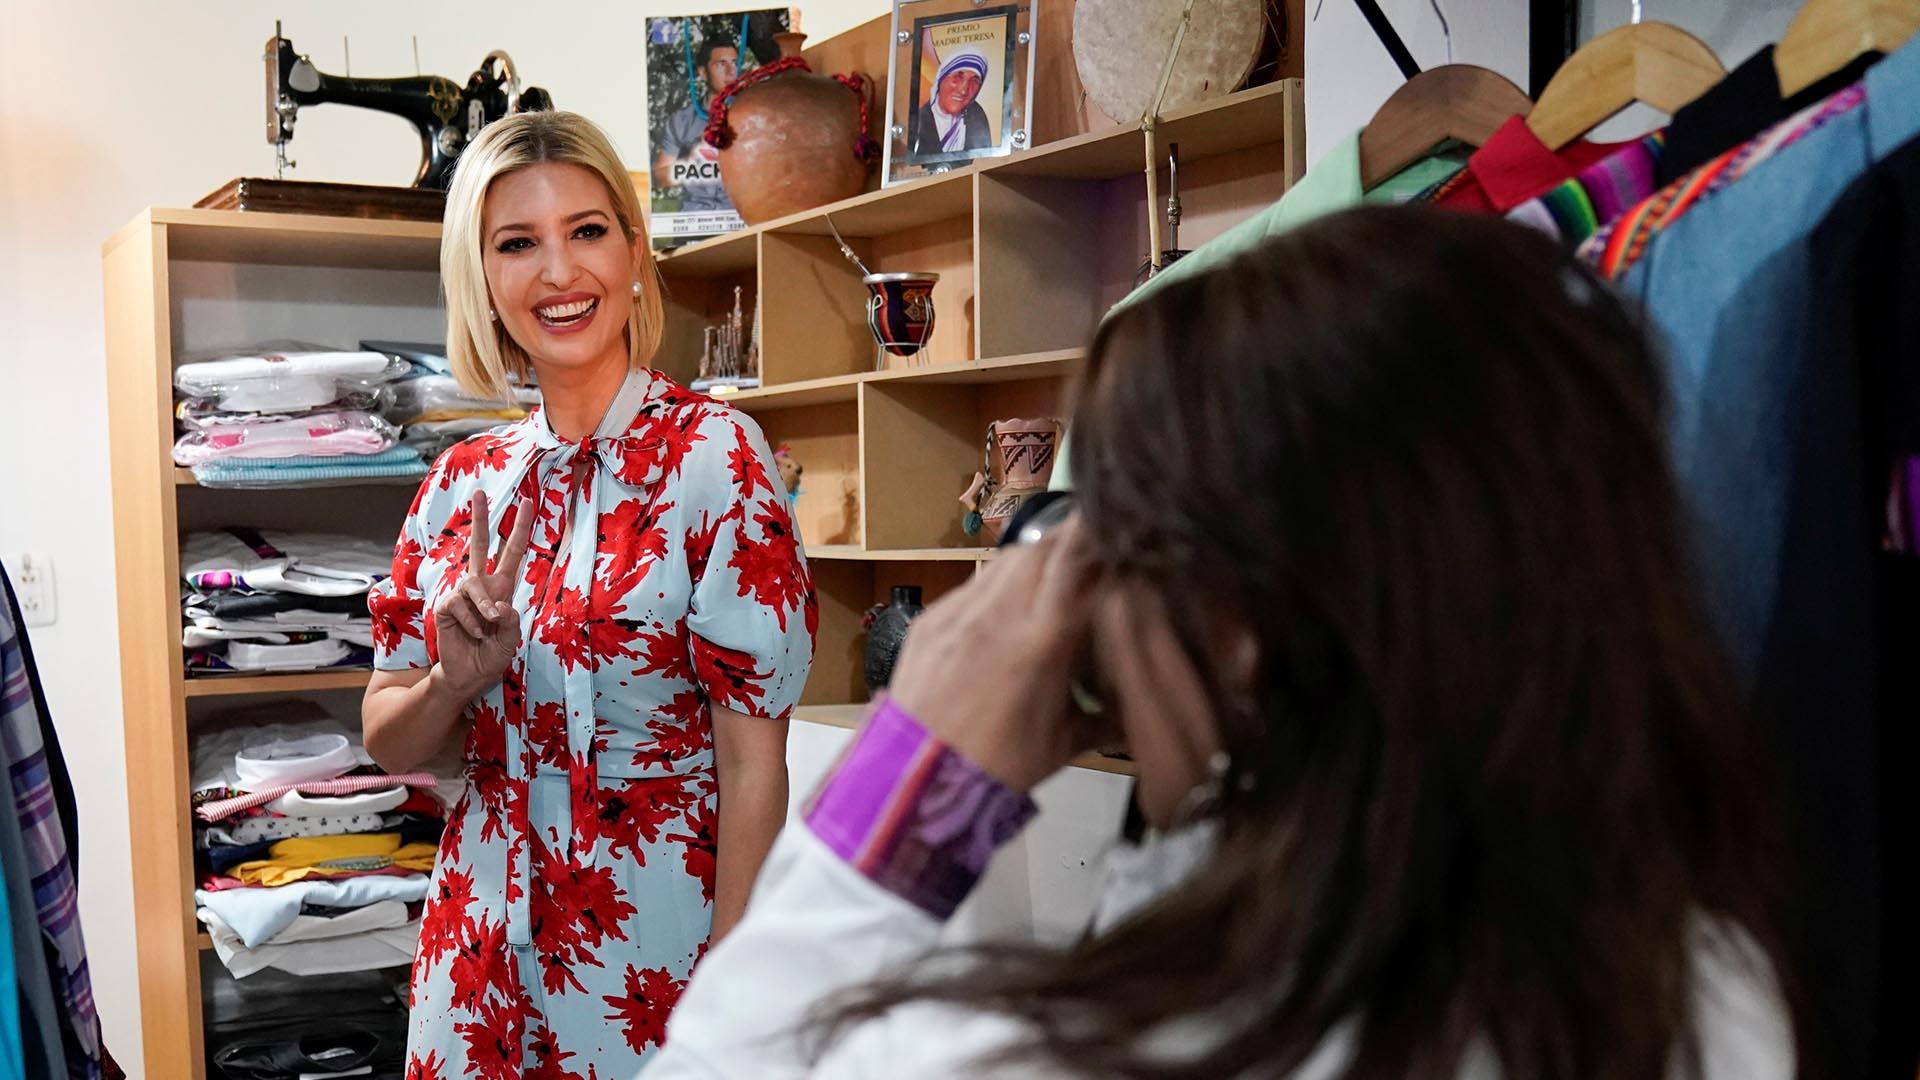 Ivanka visitó una tradicional tienda de ropa de Jujuy